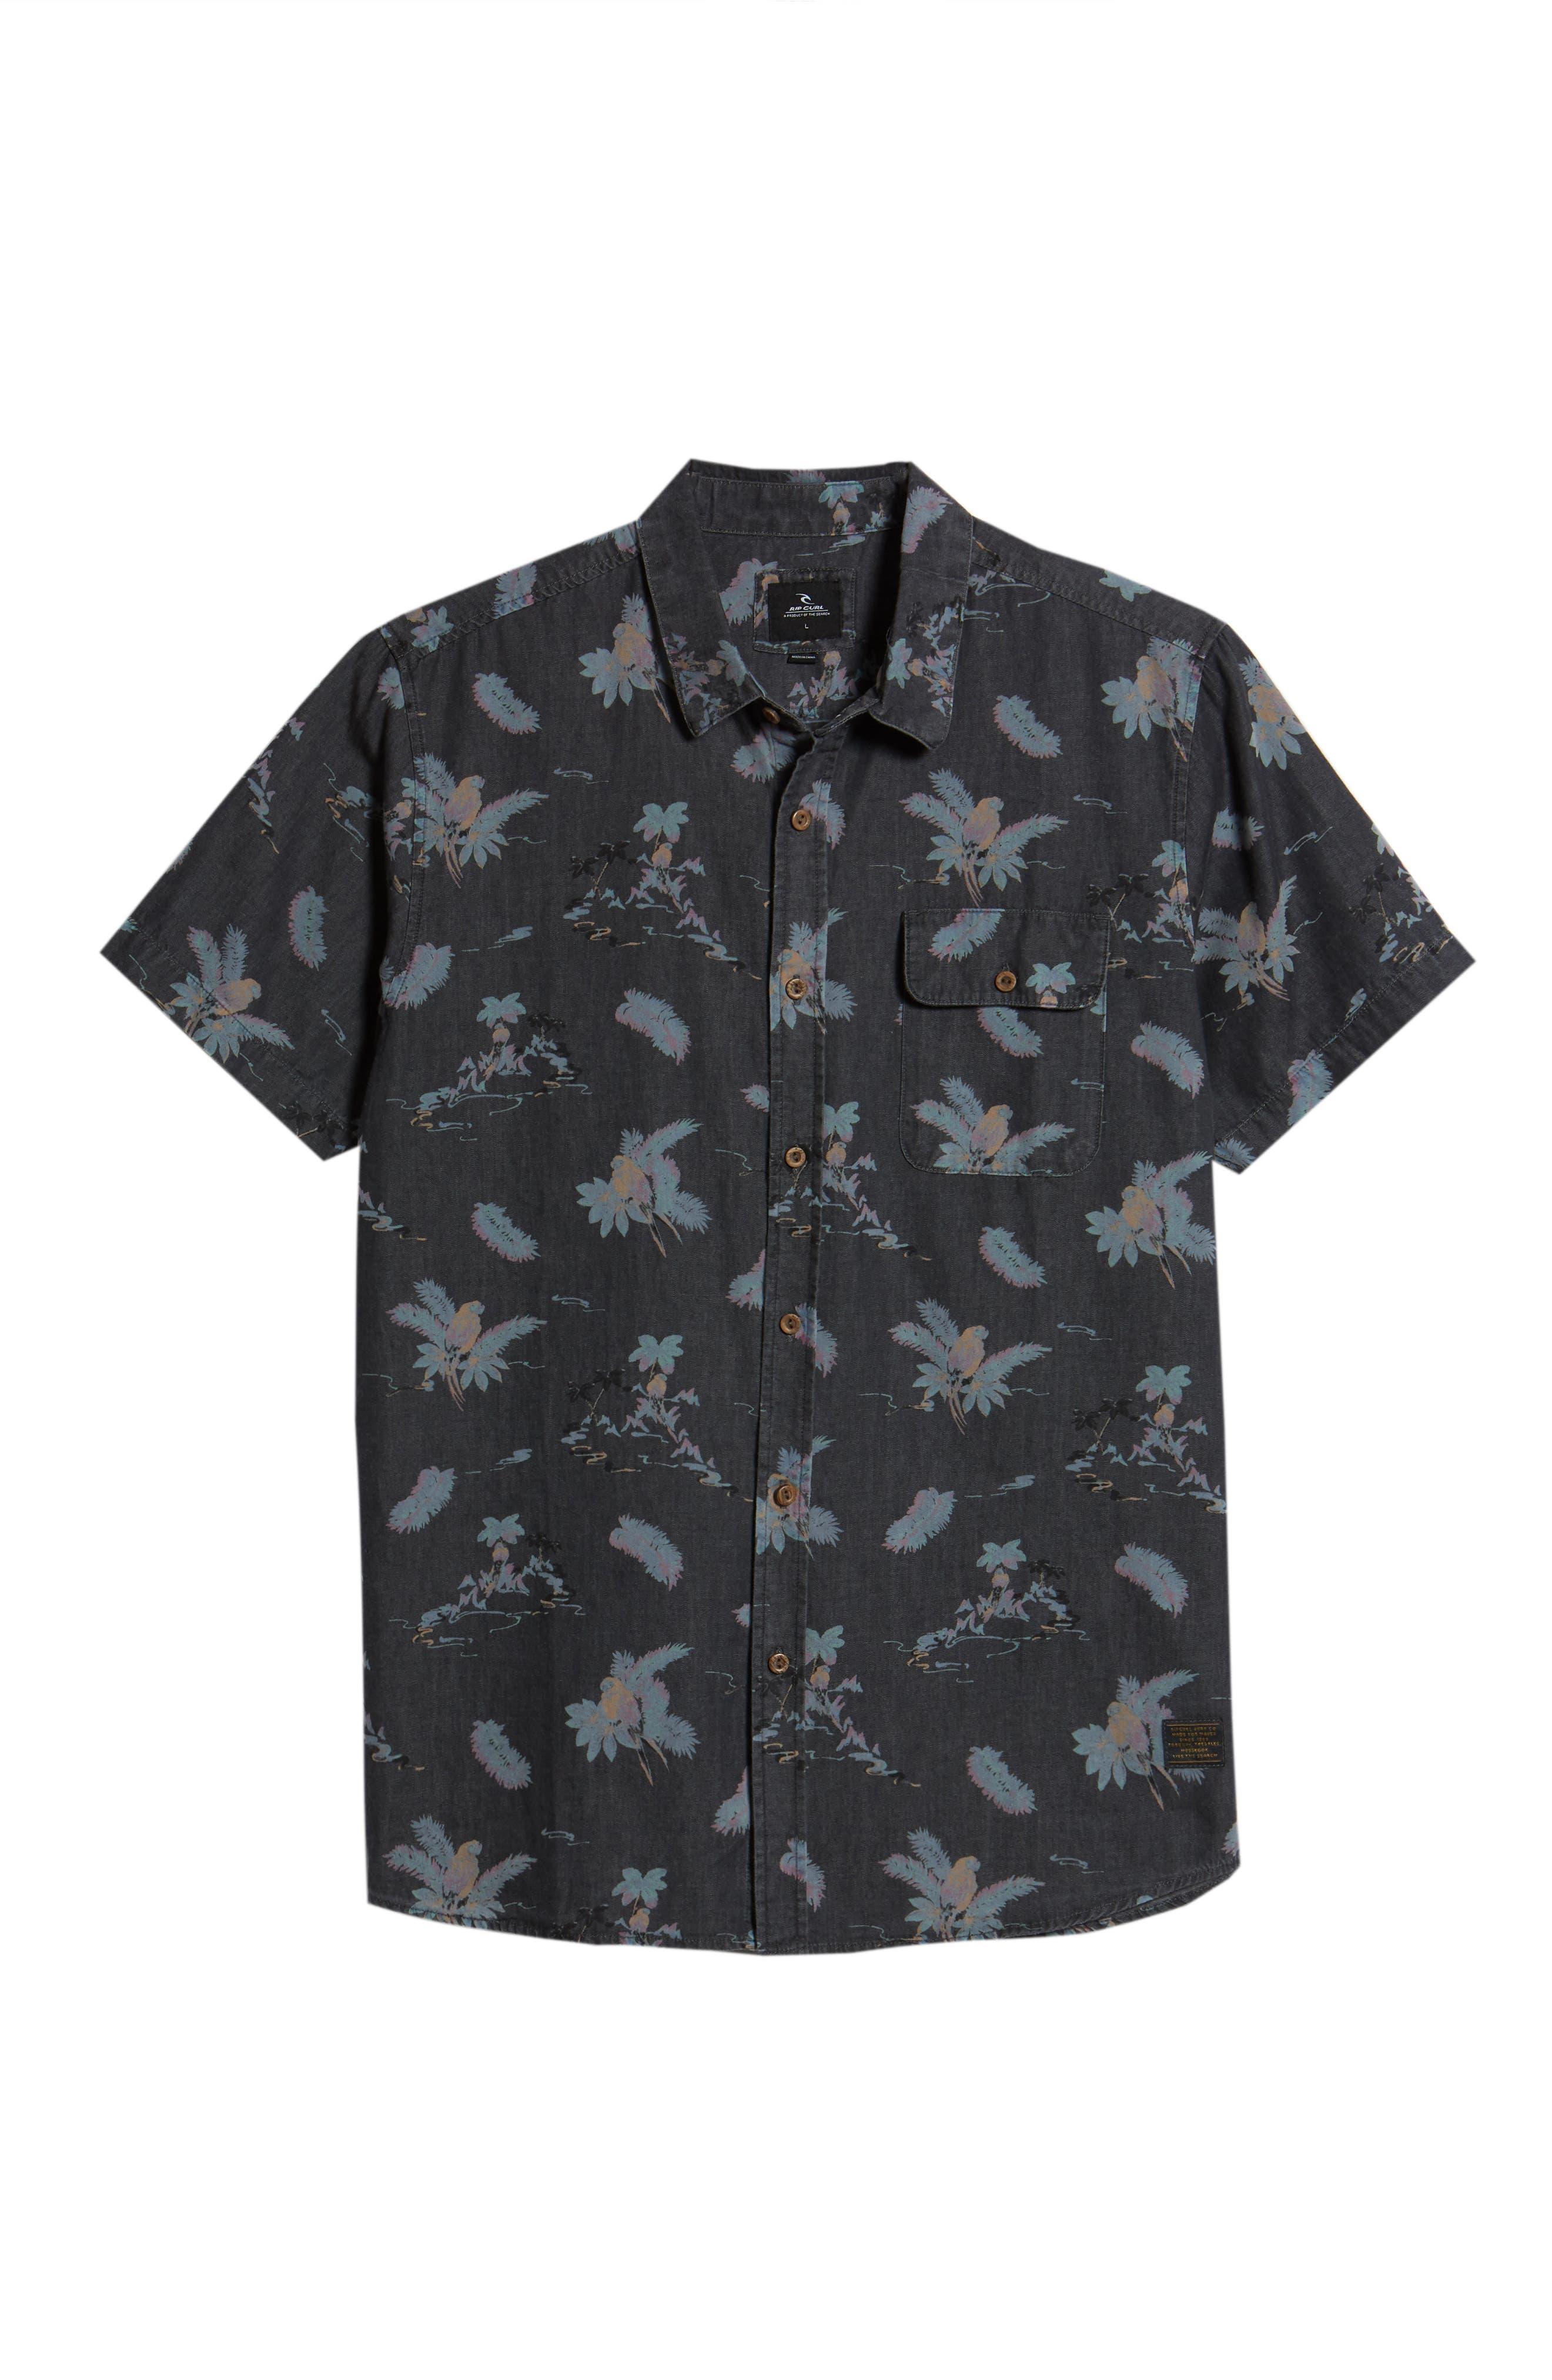 Meledrone Woven Shirt,                             Alternate thumbnail 6, color,                             Charcoal Grey